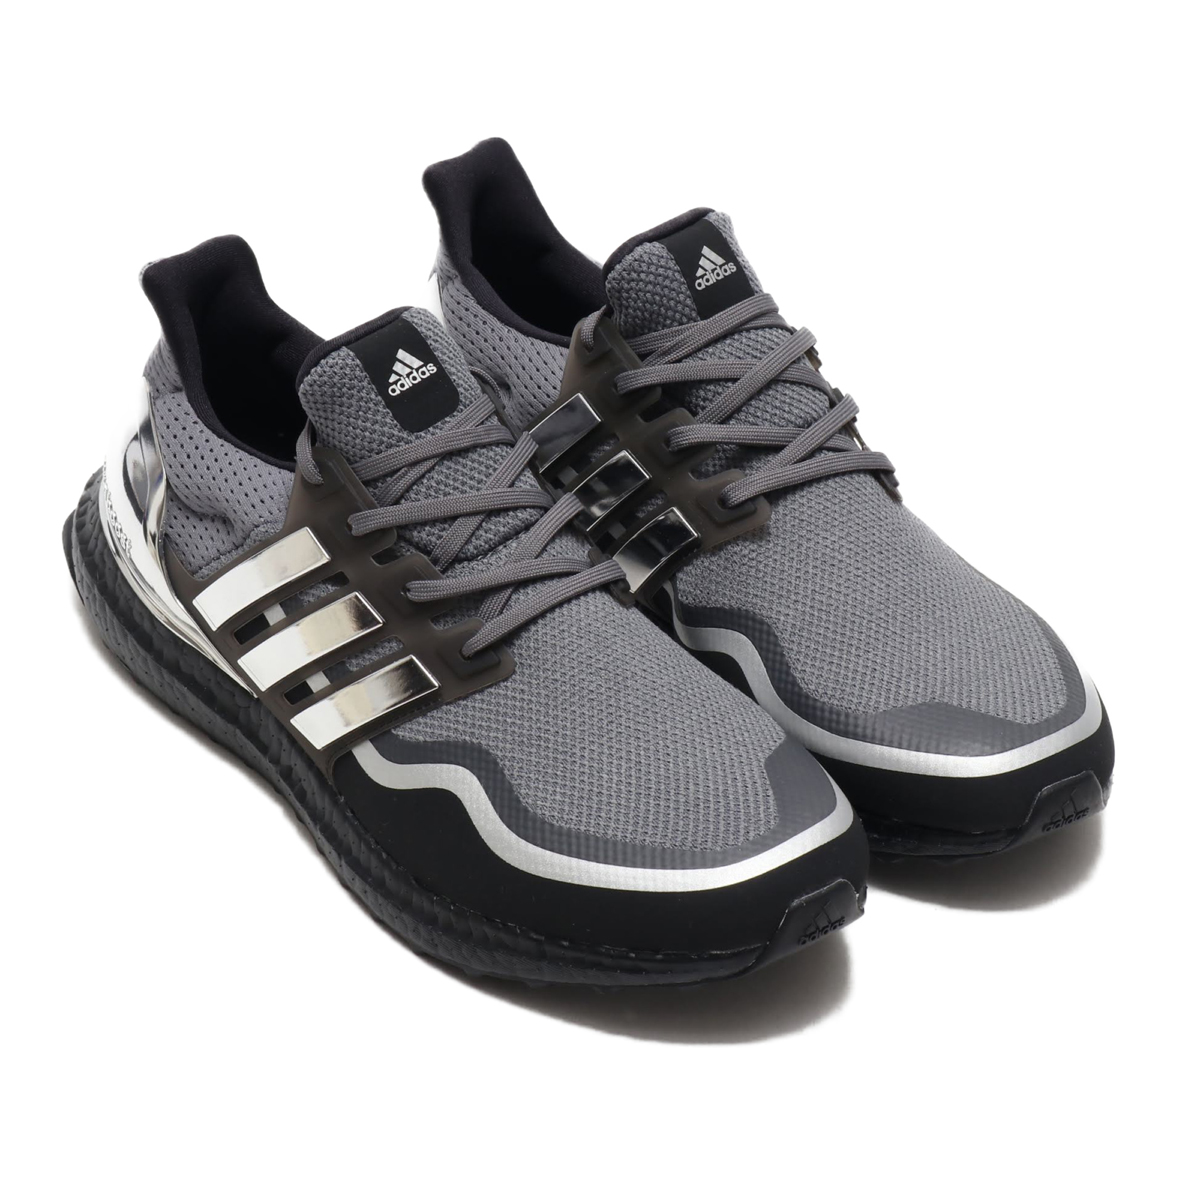 New Adidas Ultra Boost 3.0 LTD Mid Grey Tan Khaki Suede Leather